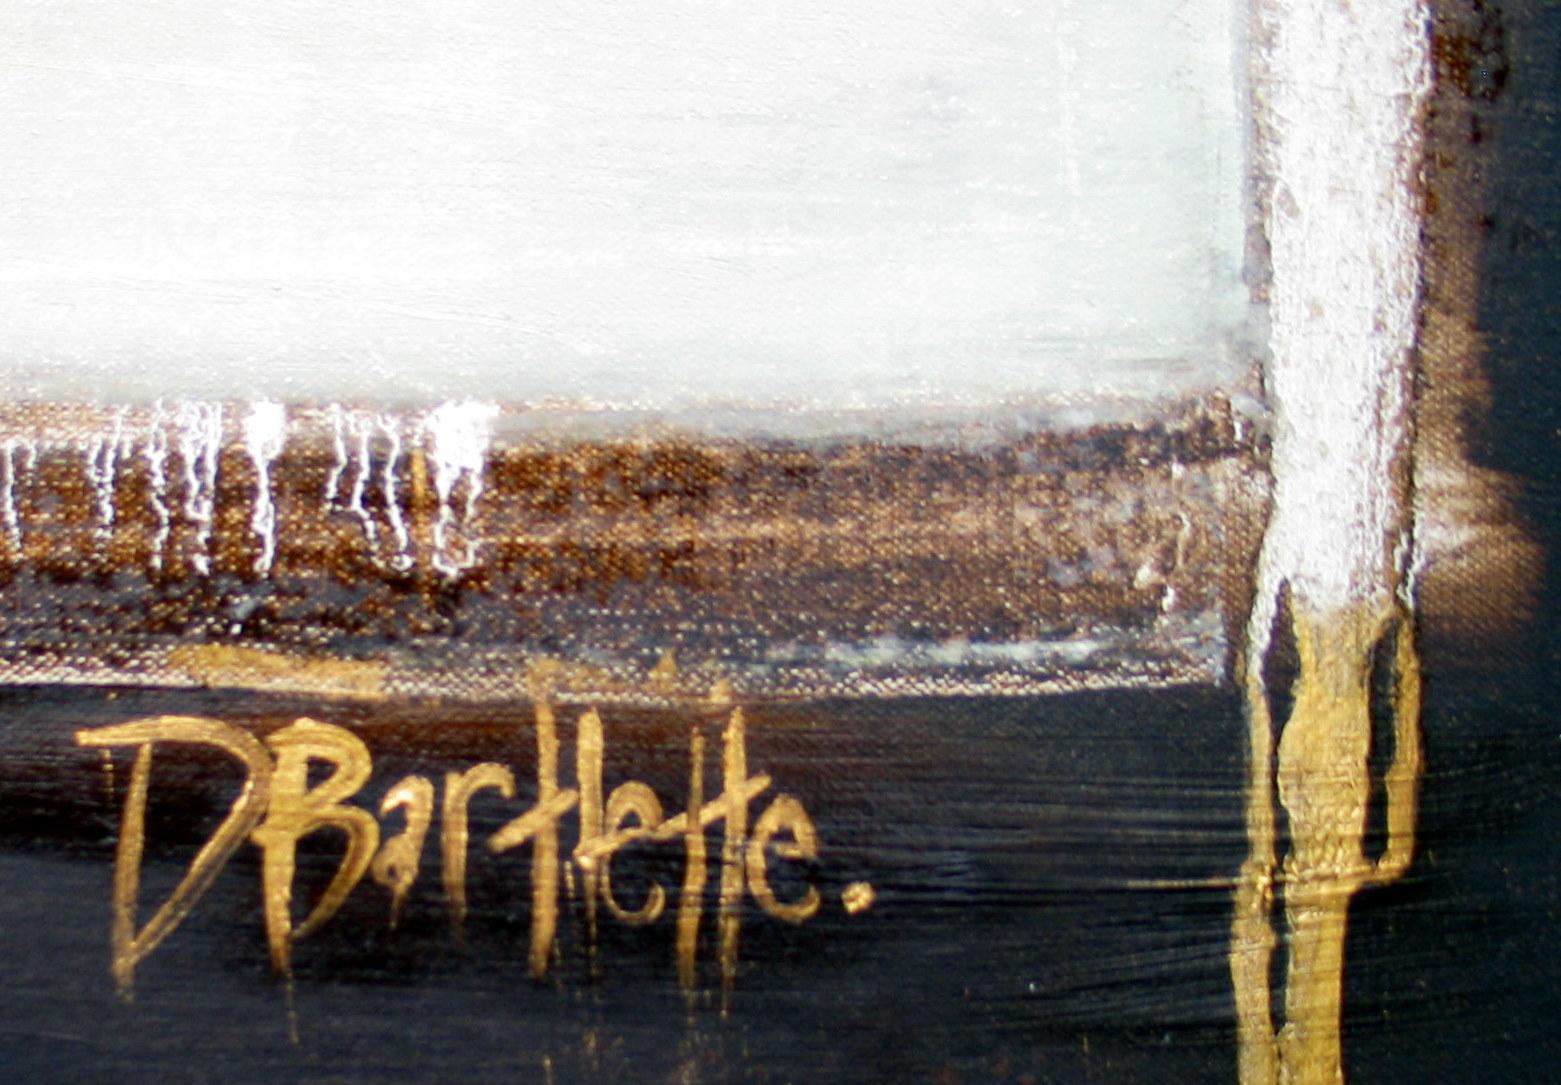 Danielle Bartlette Signature